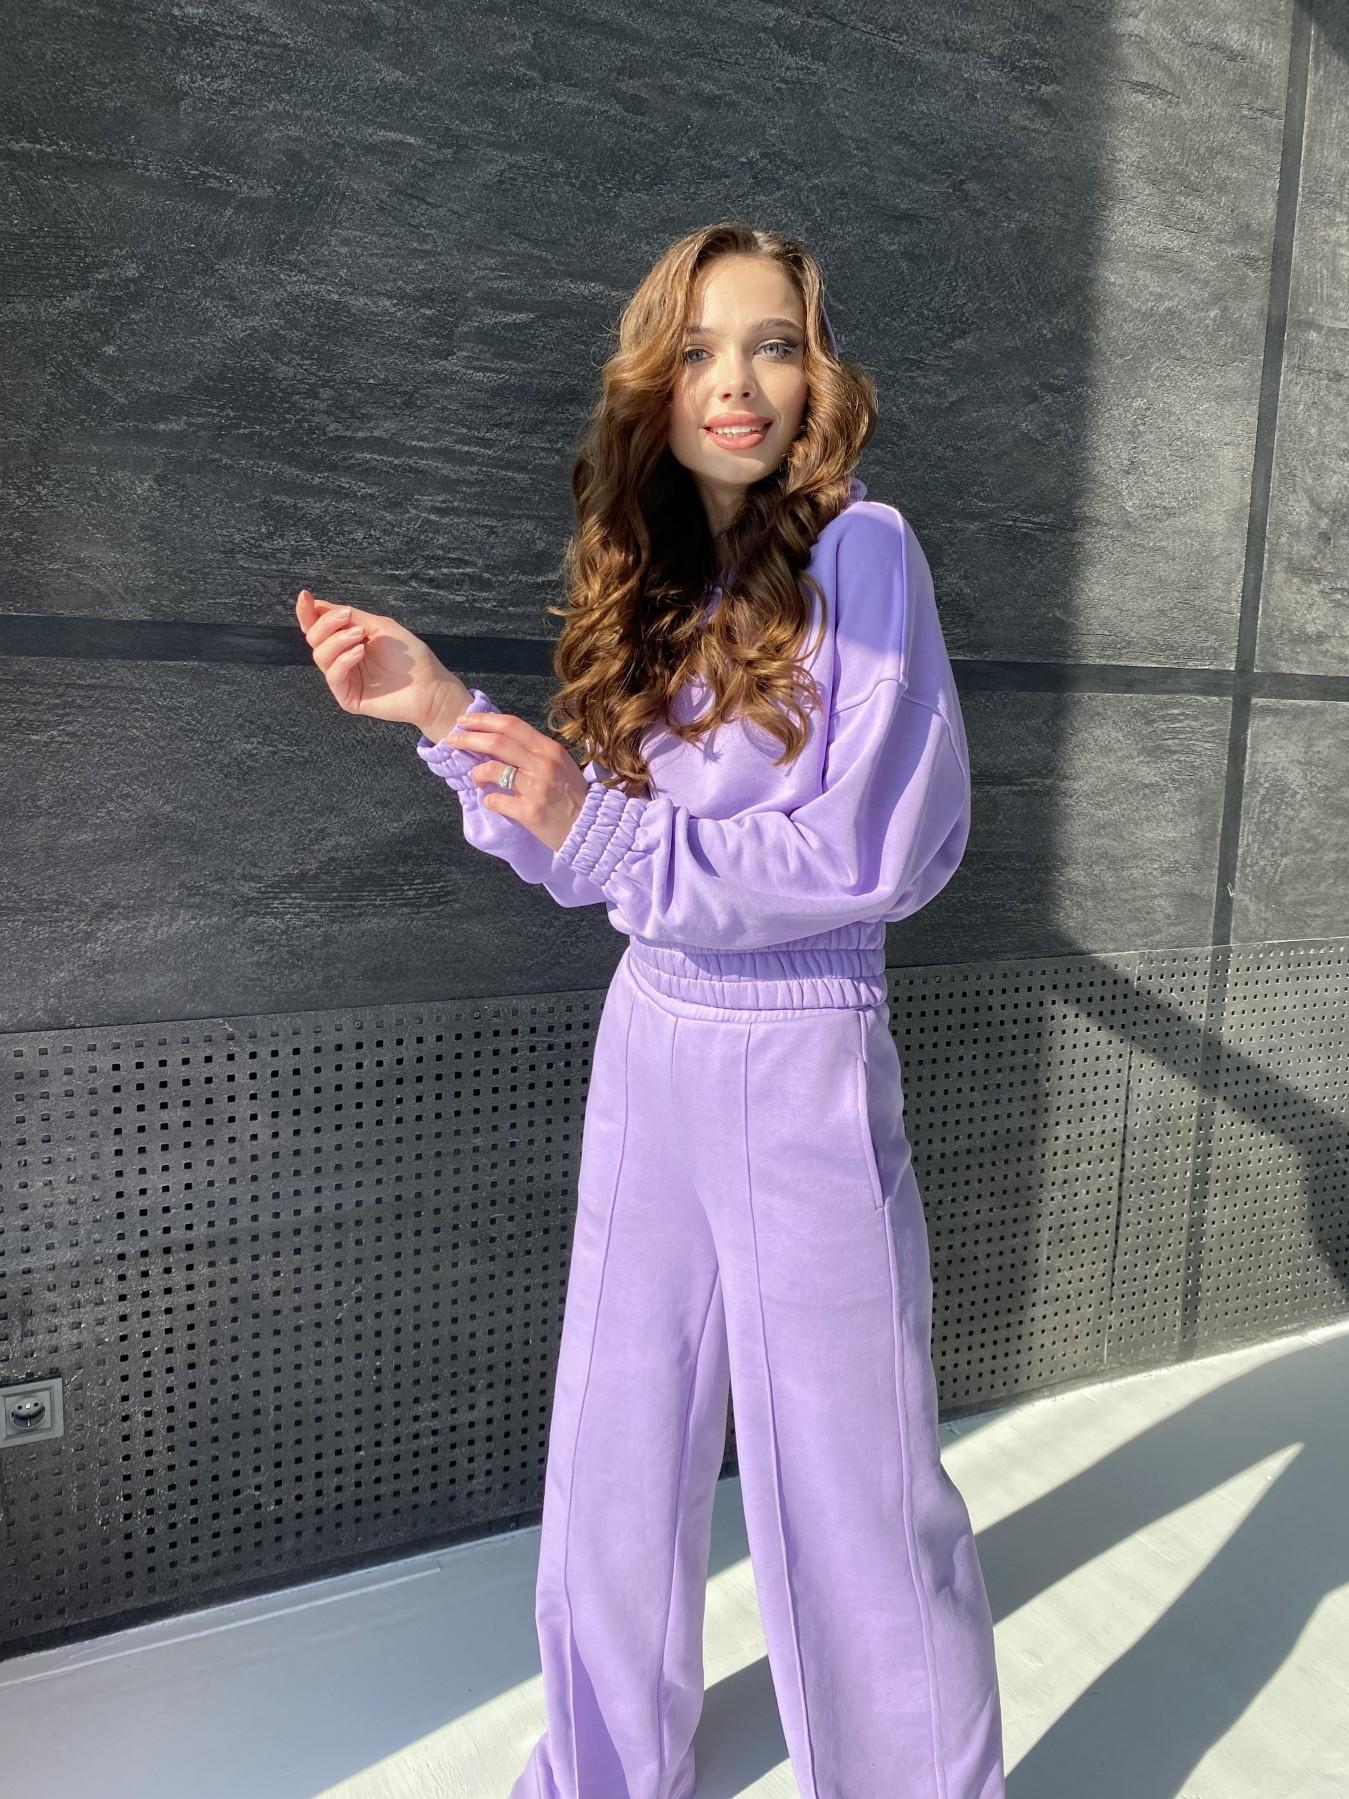 Бейби  прогулочный костюм из 3х нитки 10812 АРТ. 47283 Цвет: Лаванда - фото 1, интернет магазин tm-modus.ru